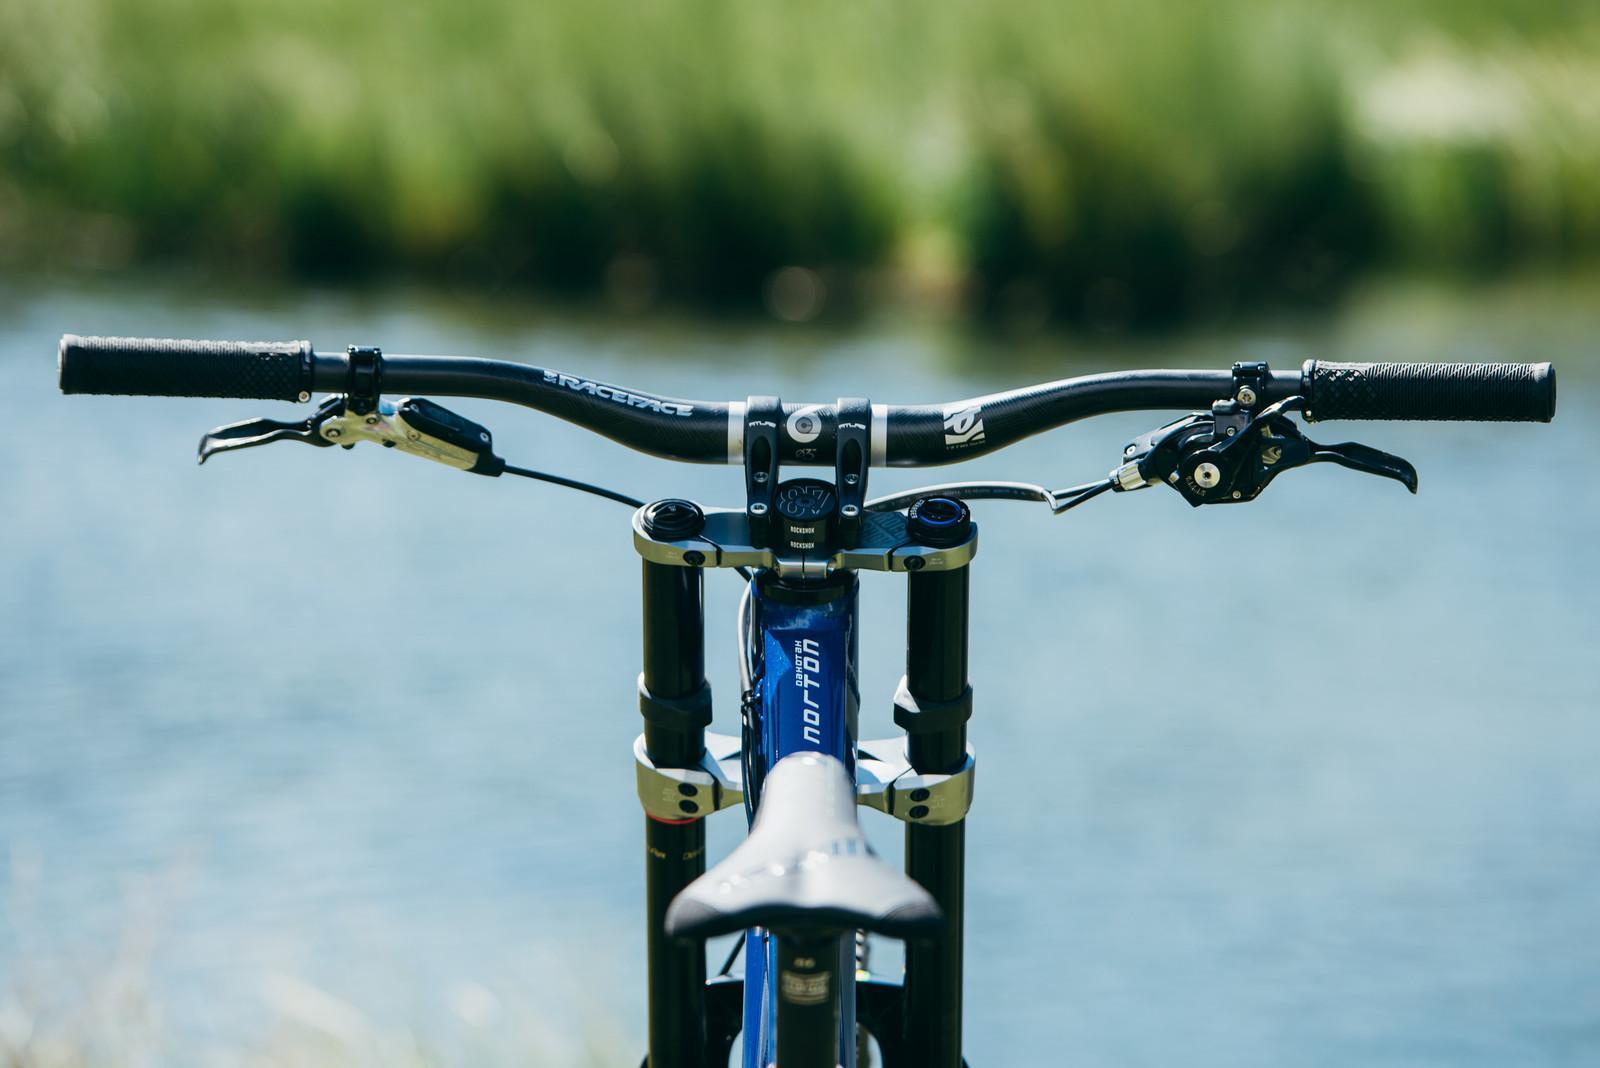 Check Out That Cockpit - WORLD CHAMPS BIKES - Unior/Devinci Factory Racing - Mountain Biking Pictures - Vital MTB